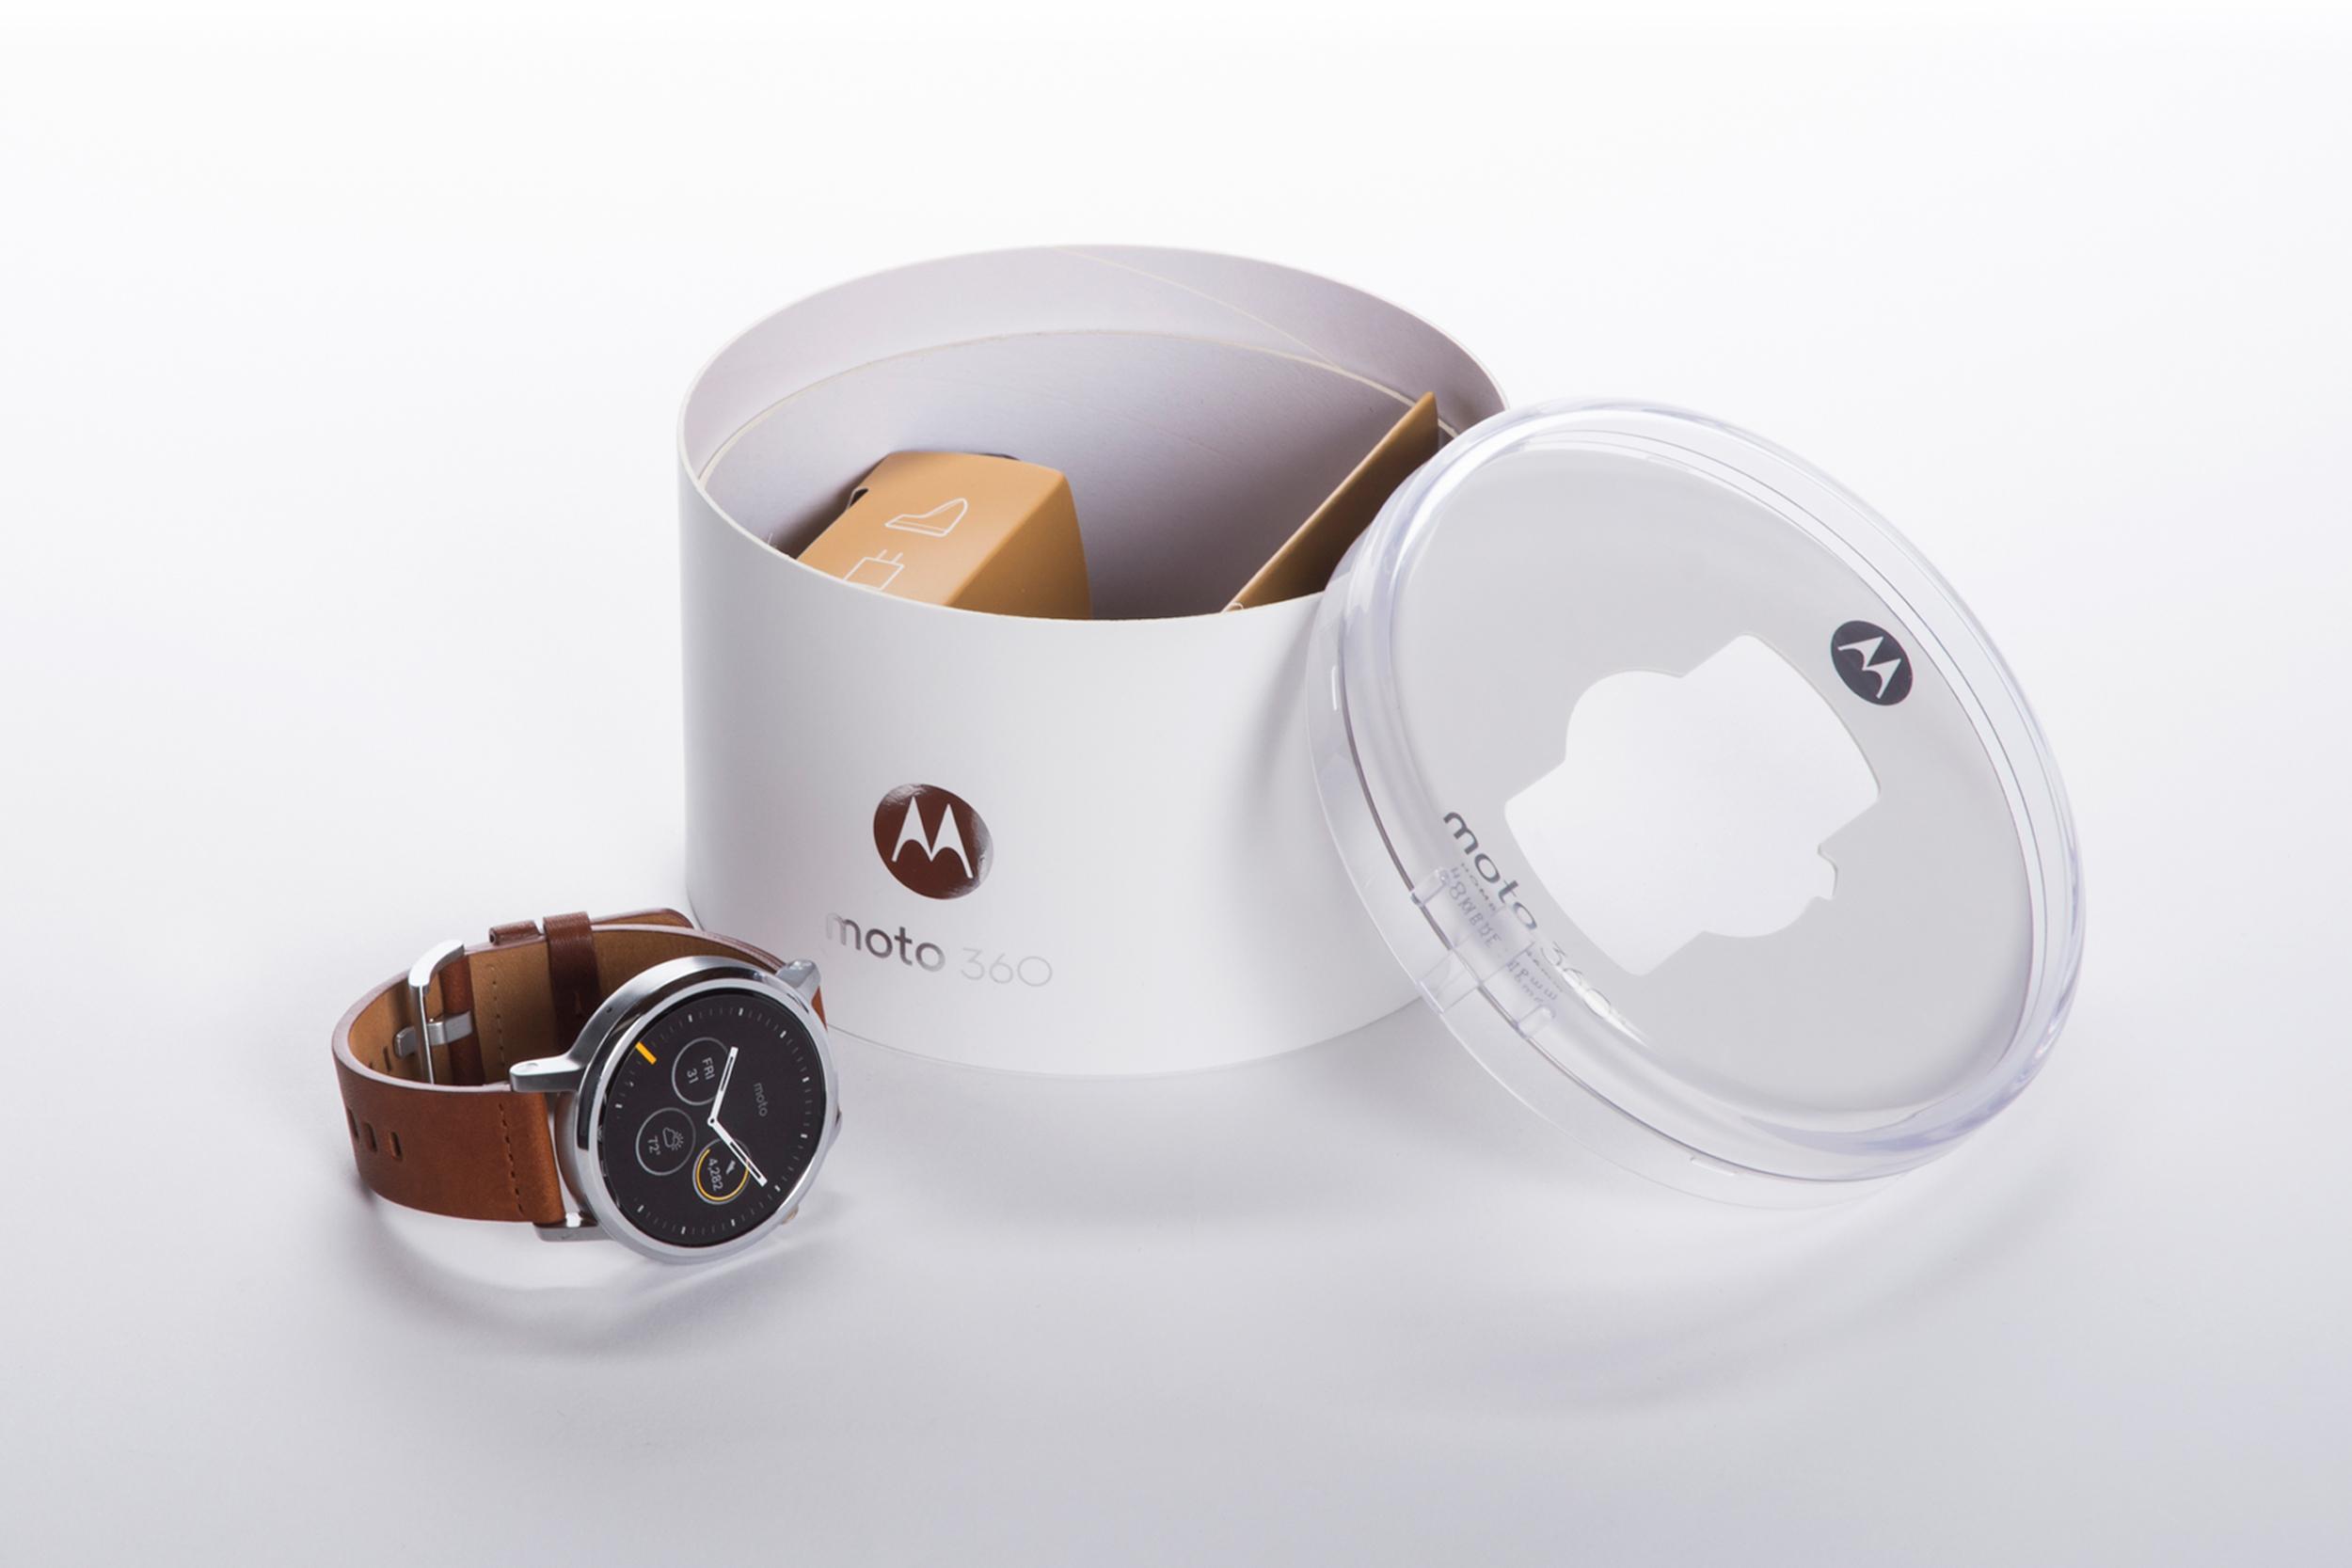 Motorola Moto 360 2nd Gen  |  Packaging Structure Design